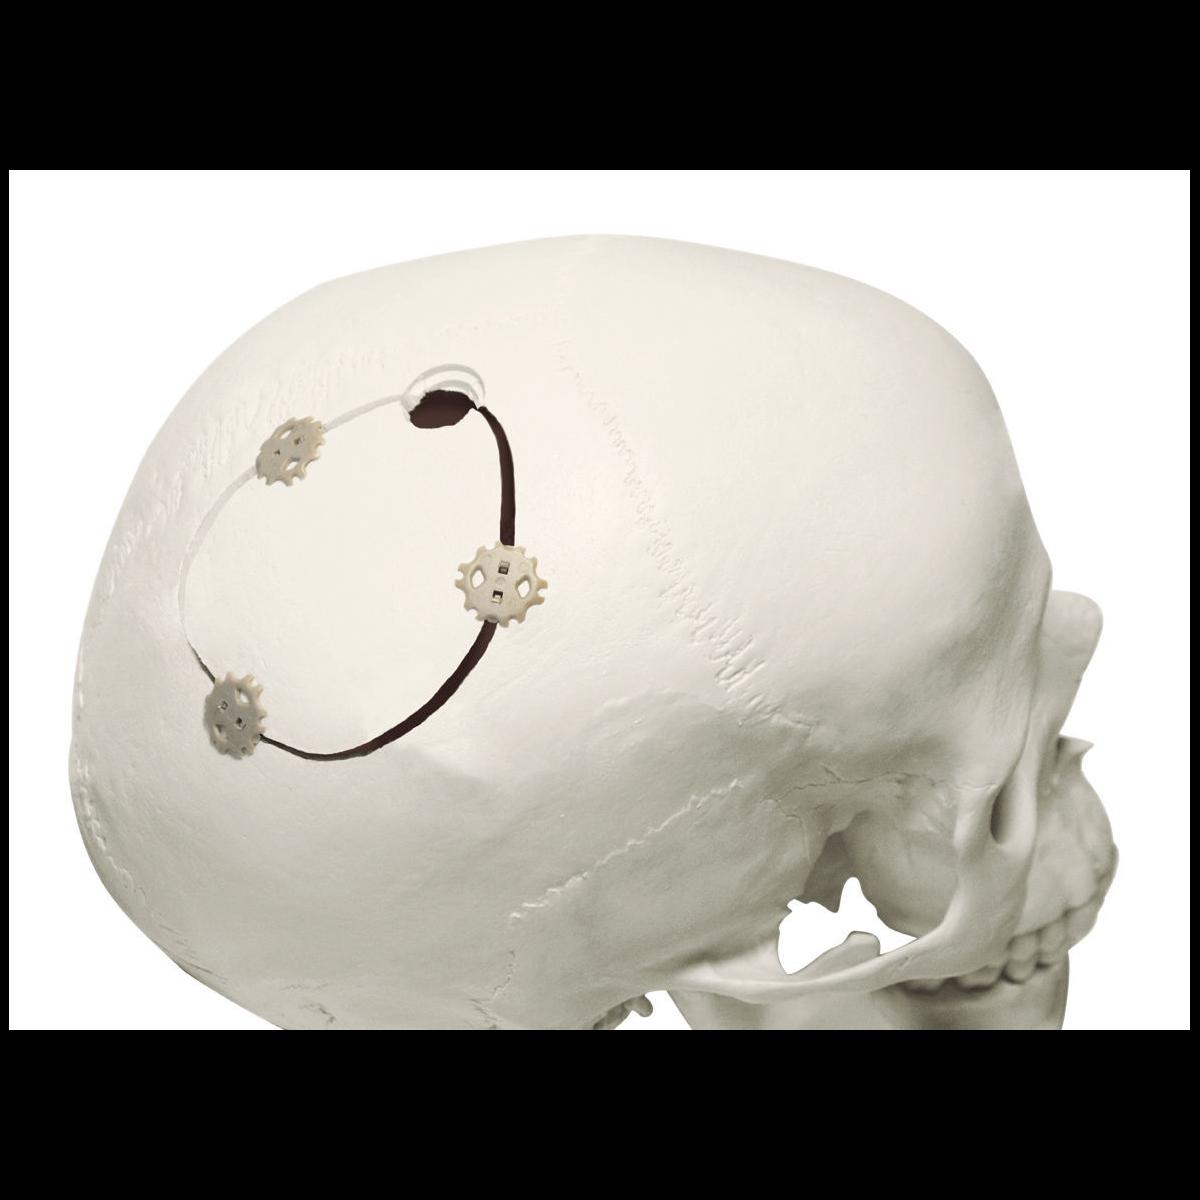 Cranial fixation system